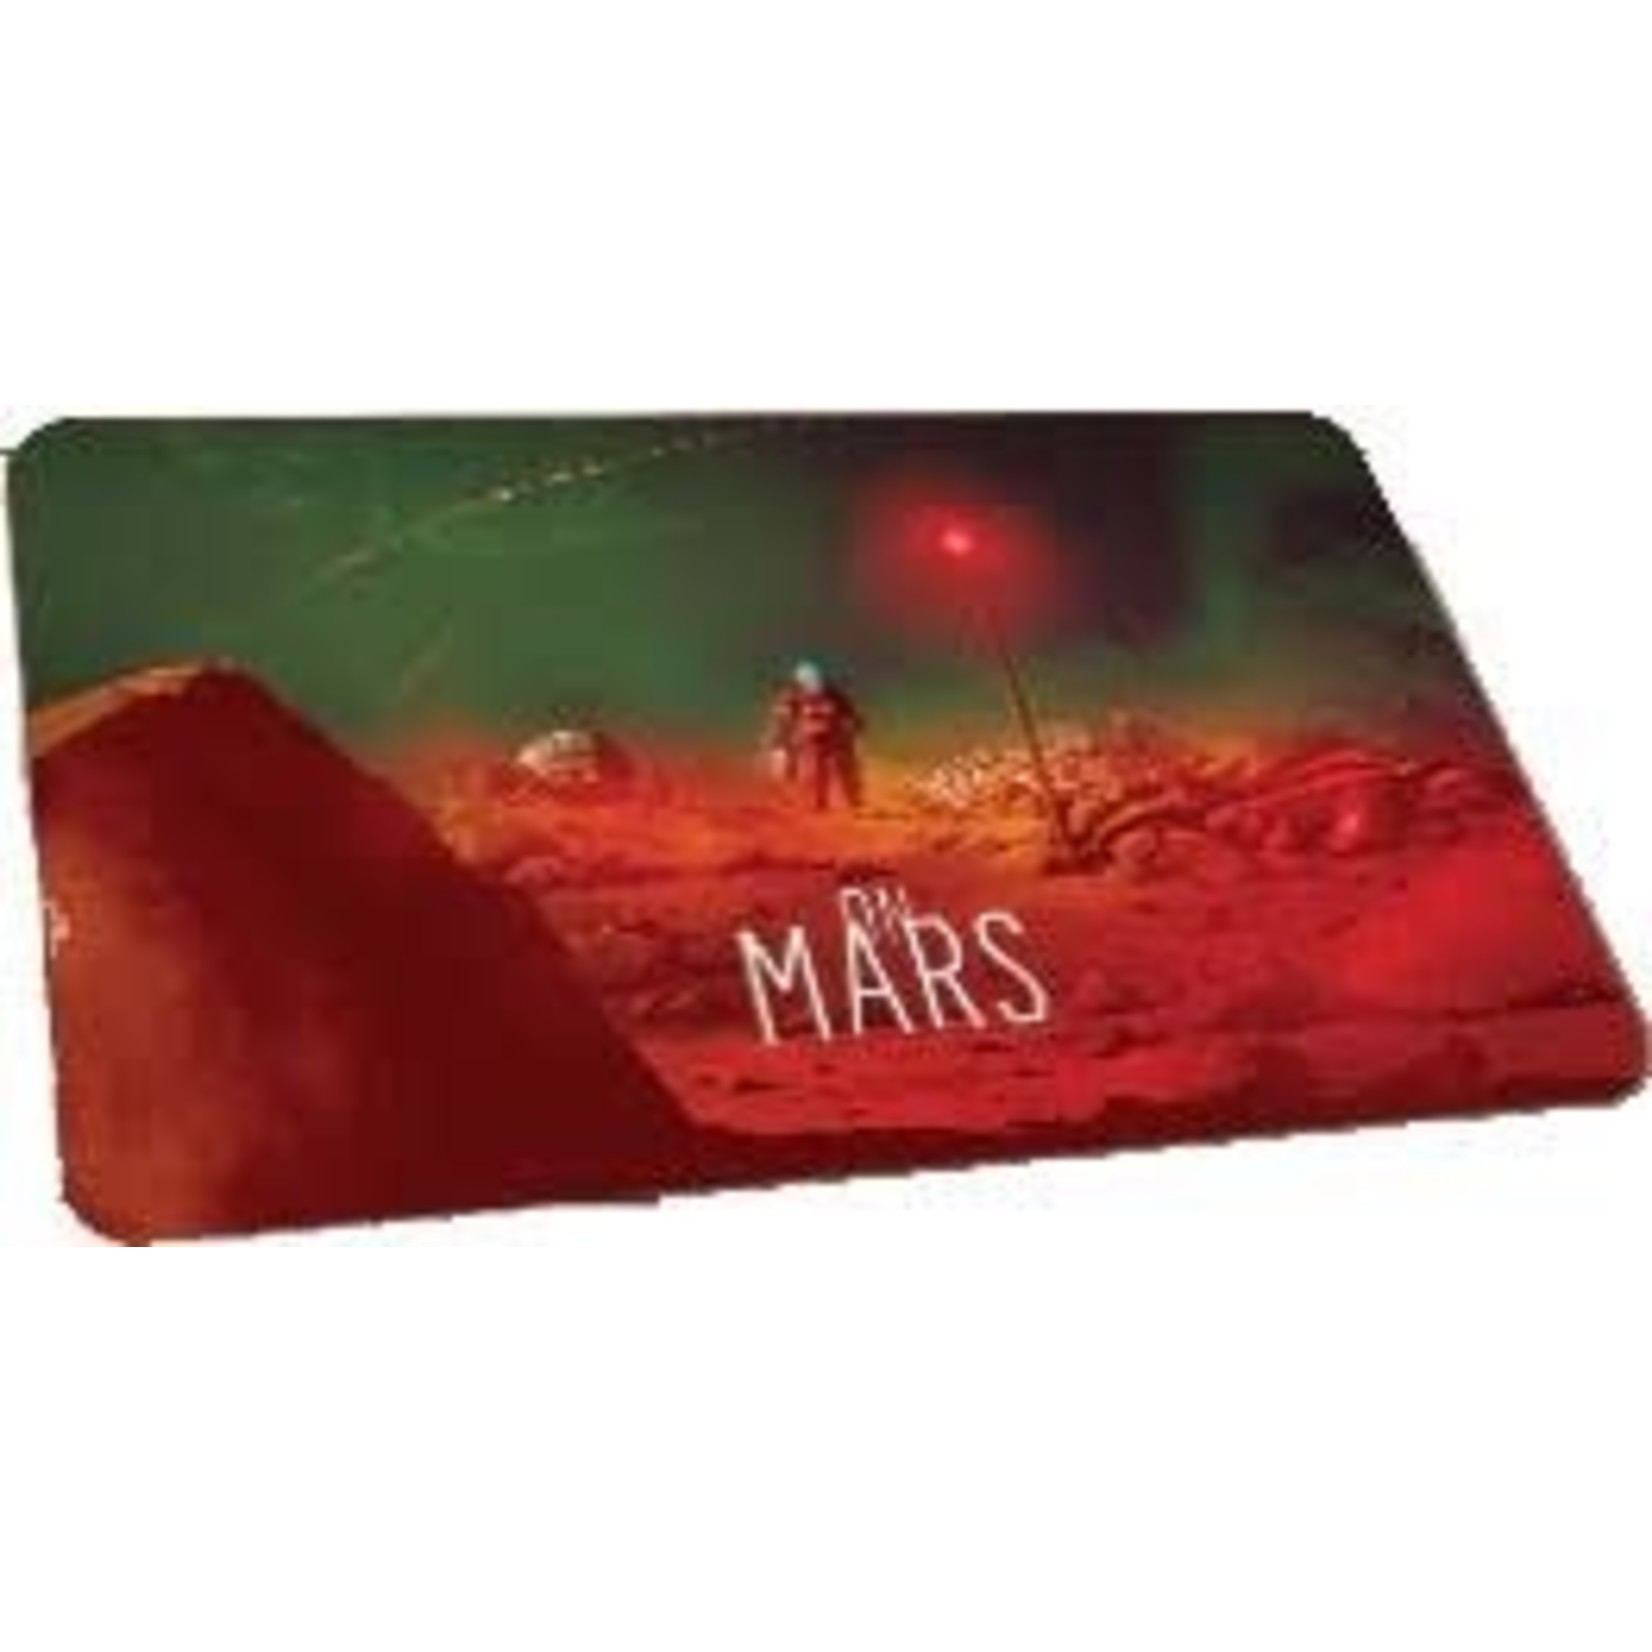 "Eagle-Gryphon On Mars Playmat (24""x14"")"